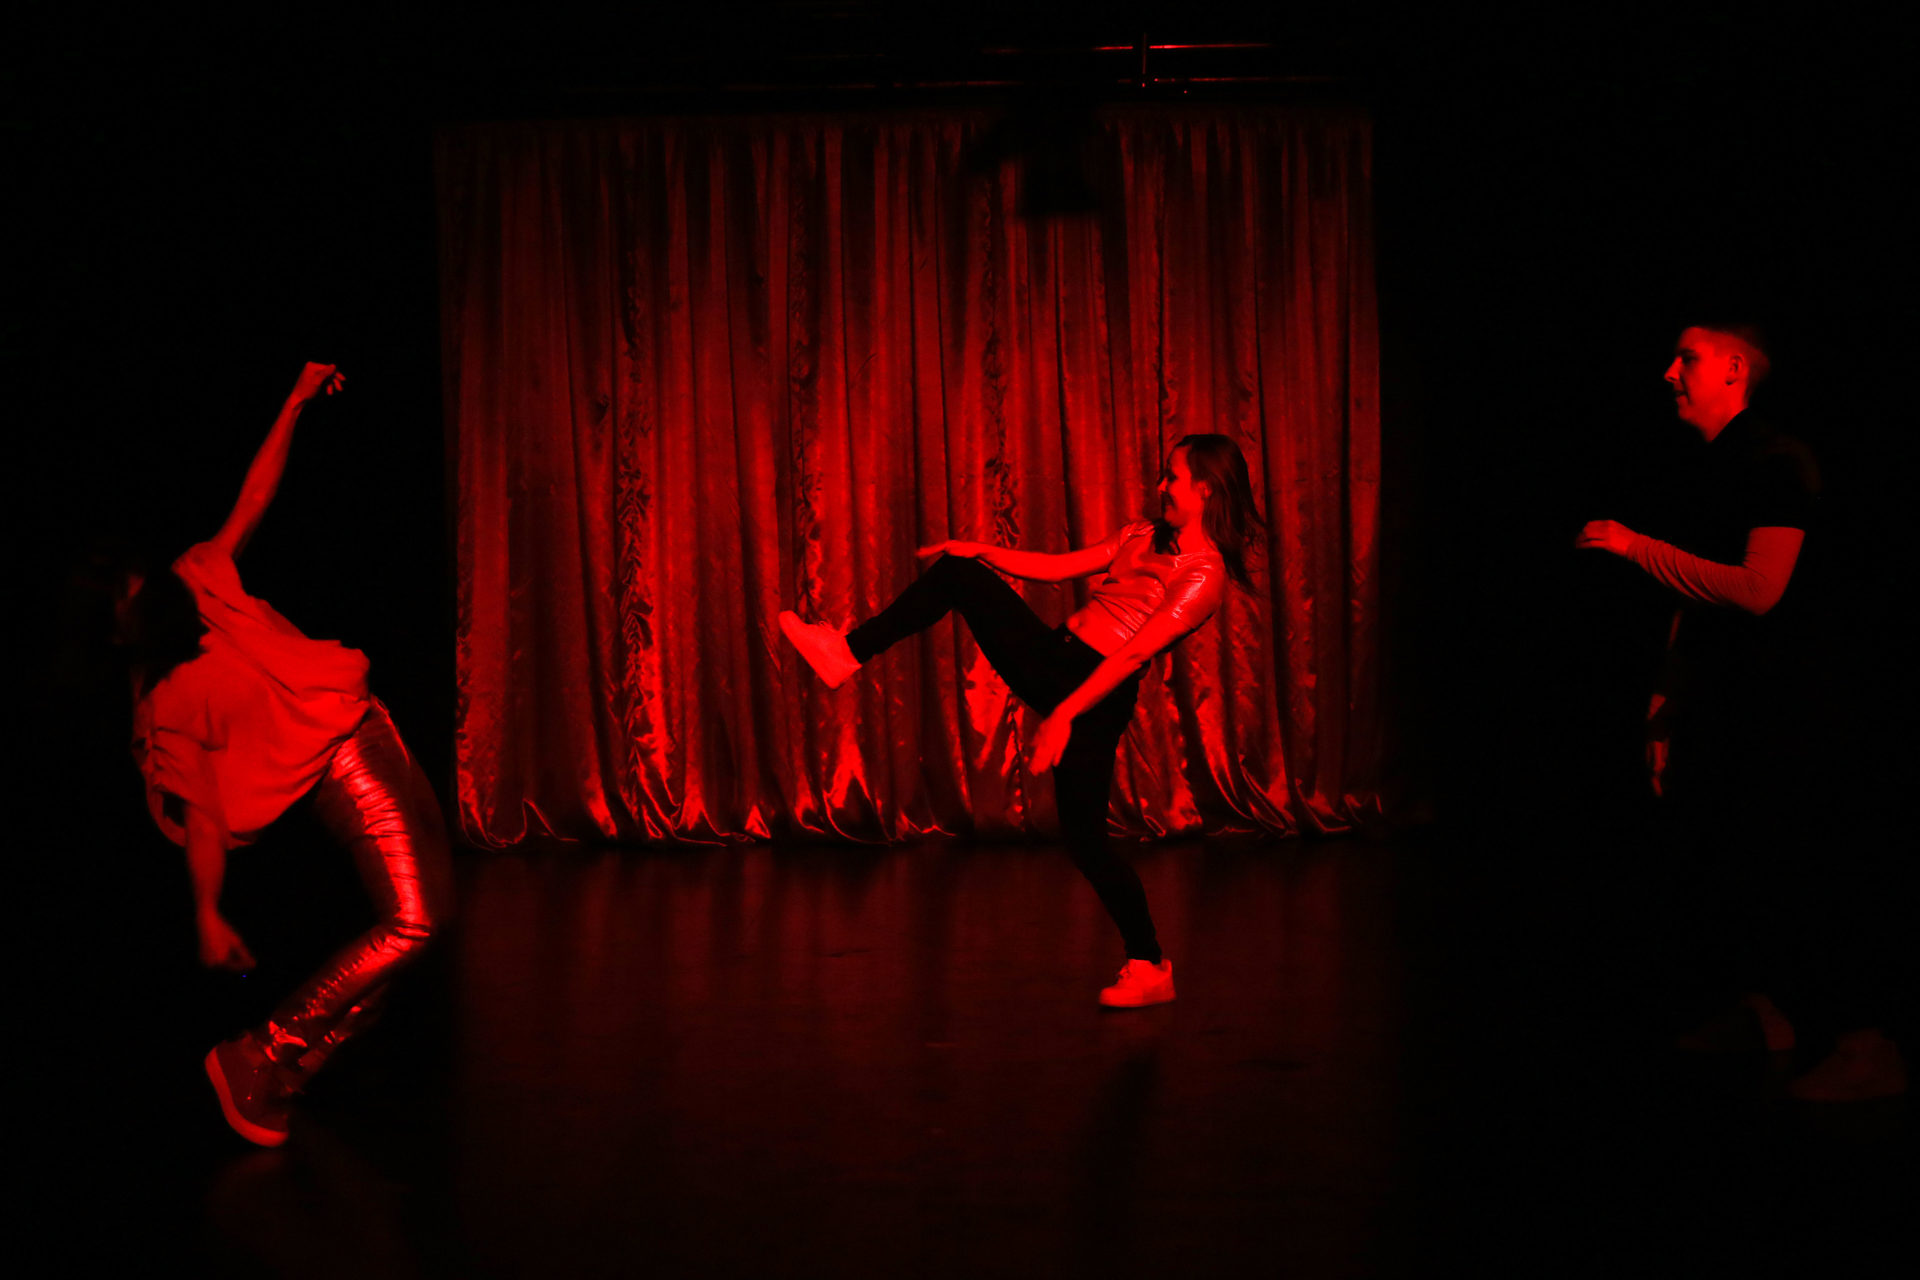 Dance_Forever_Fernanda_Ortiz_AnjaBeutler.de_692